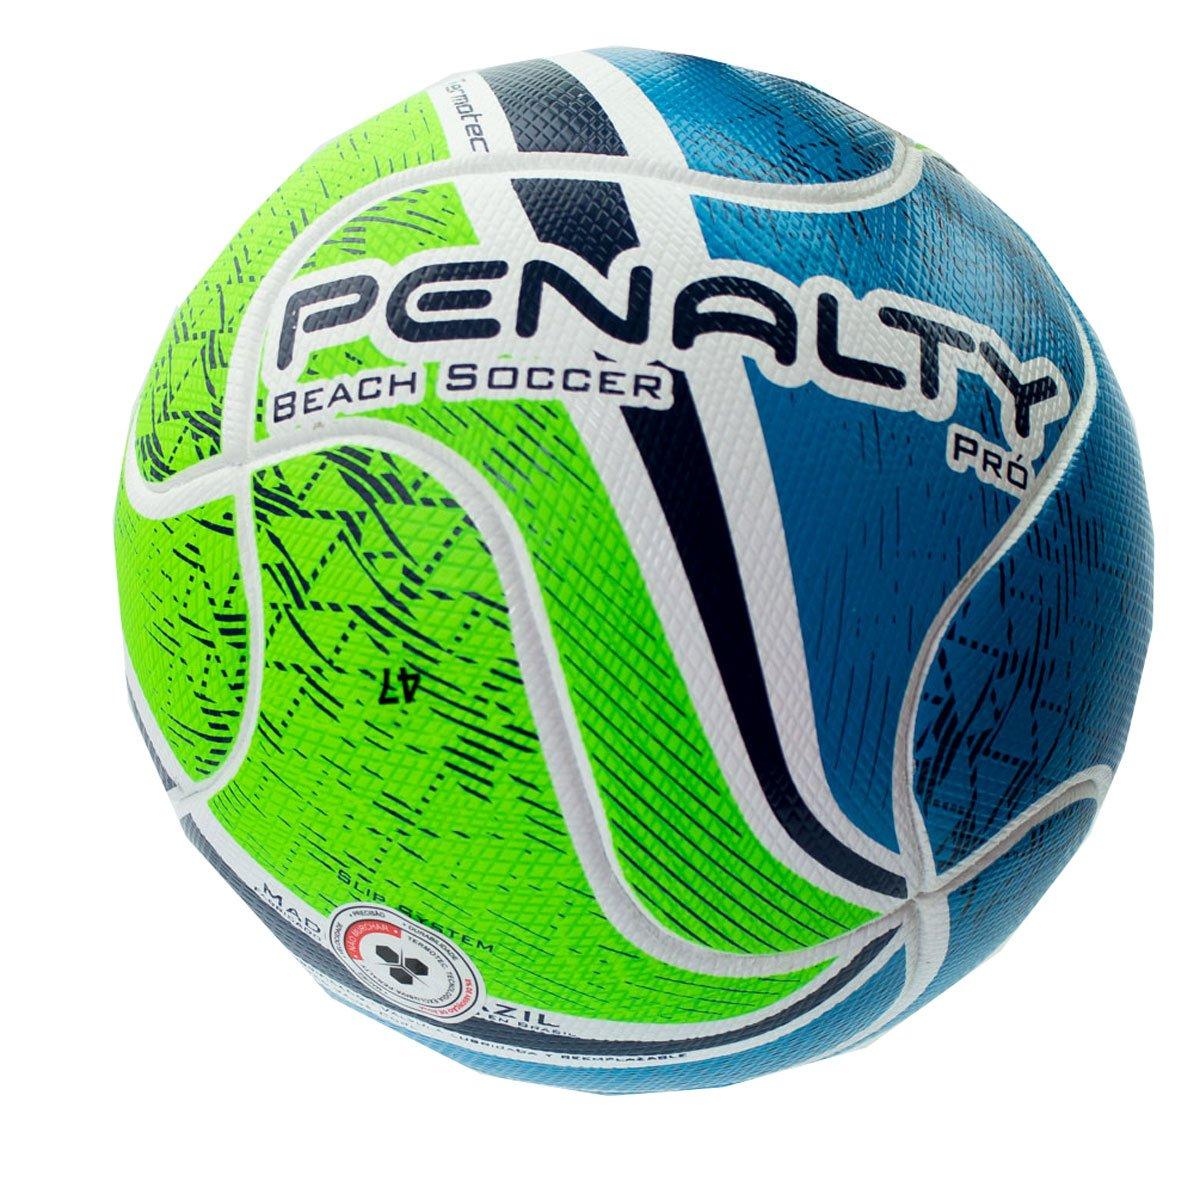 86187f0ef Bizz Store - Bola Penalty Beach Soccer PRO Futebol de Areia